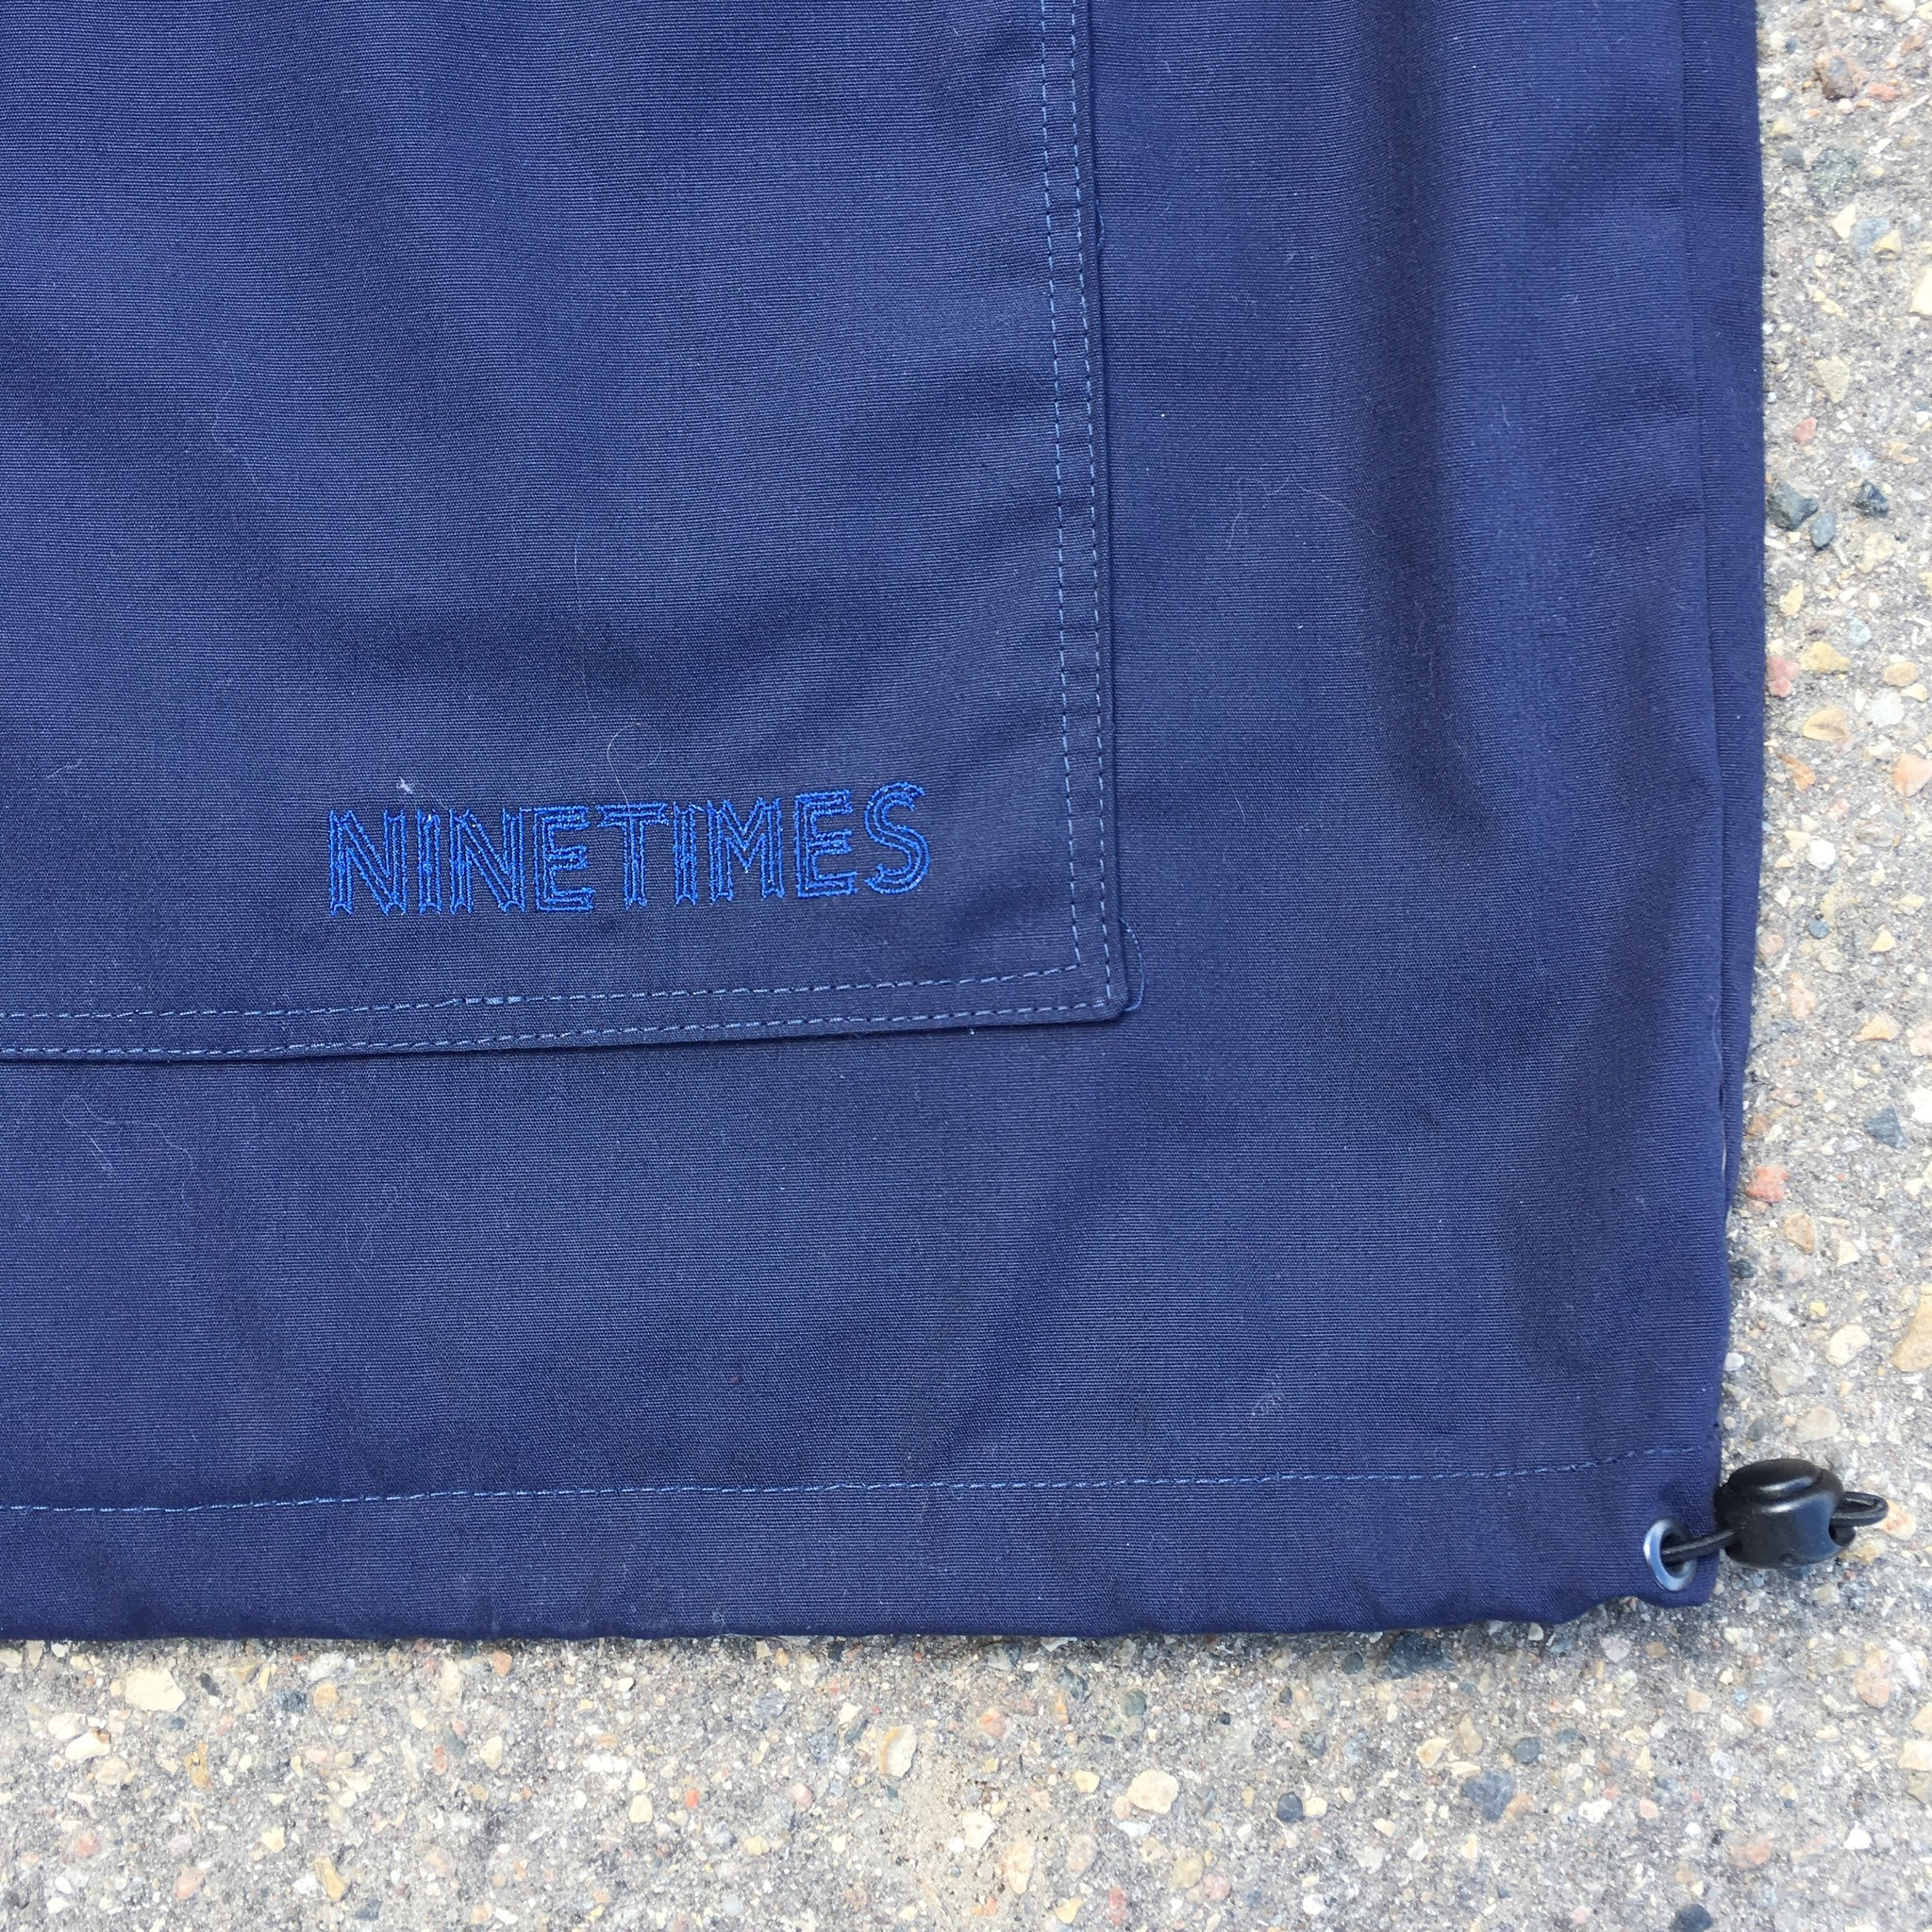 Ninetimes Ninetimes Anorak Jacket - Olive/Navy